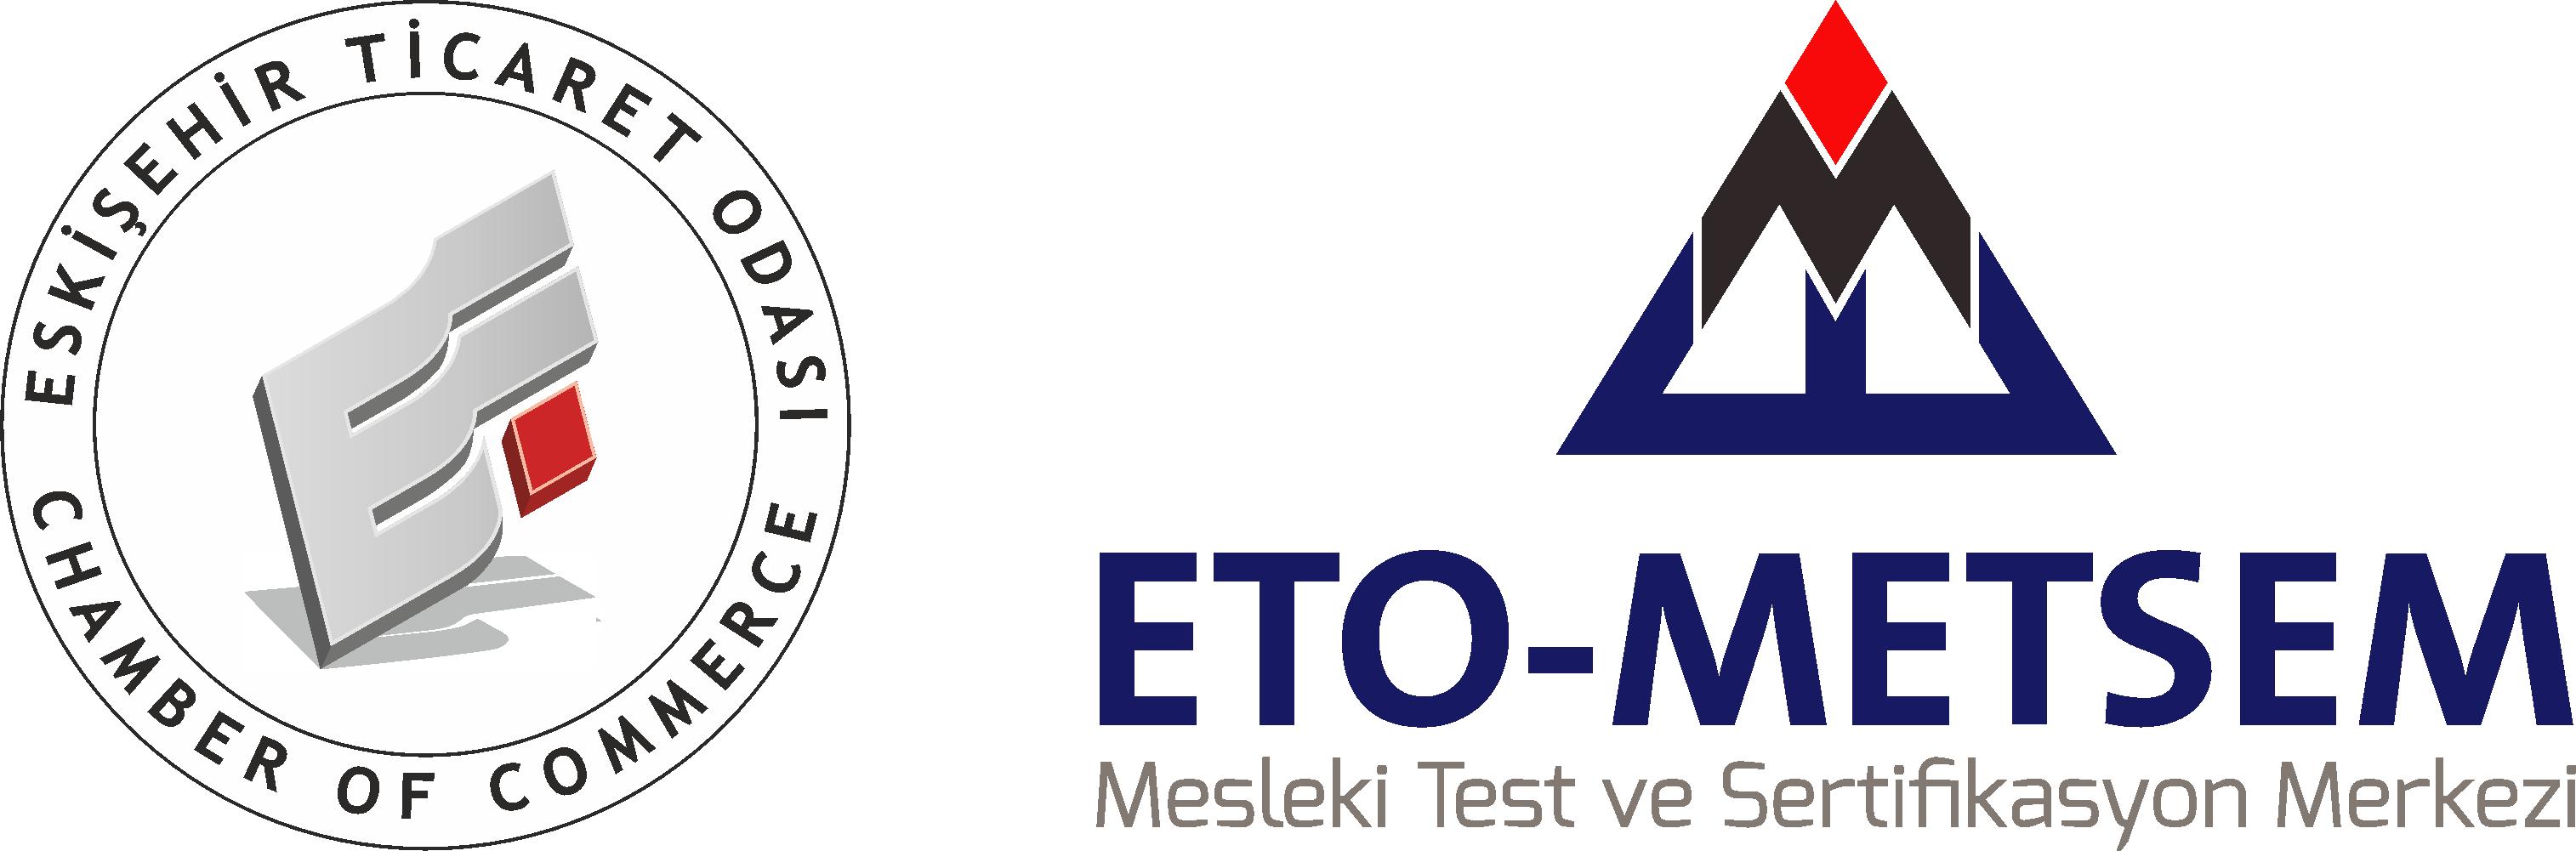 ETO-METSEM